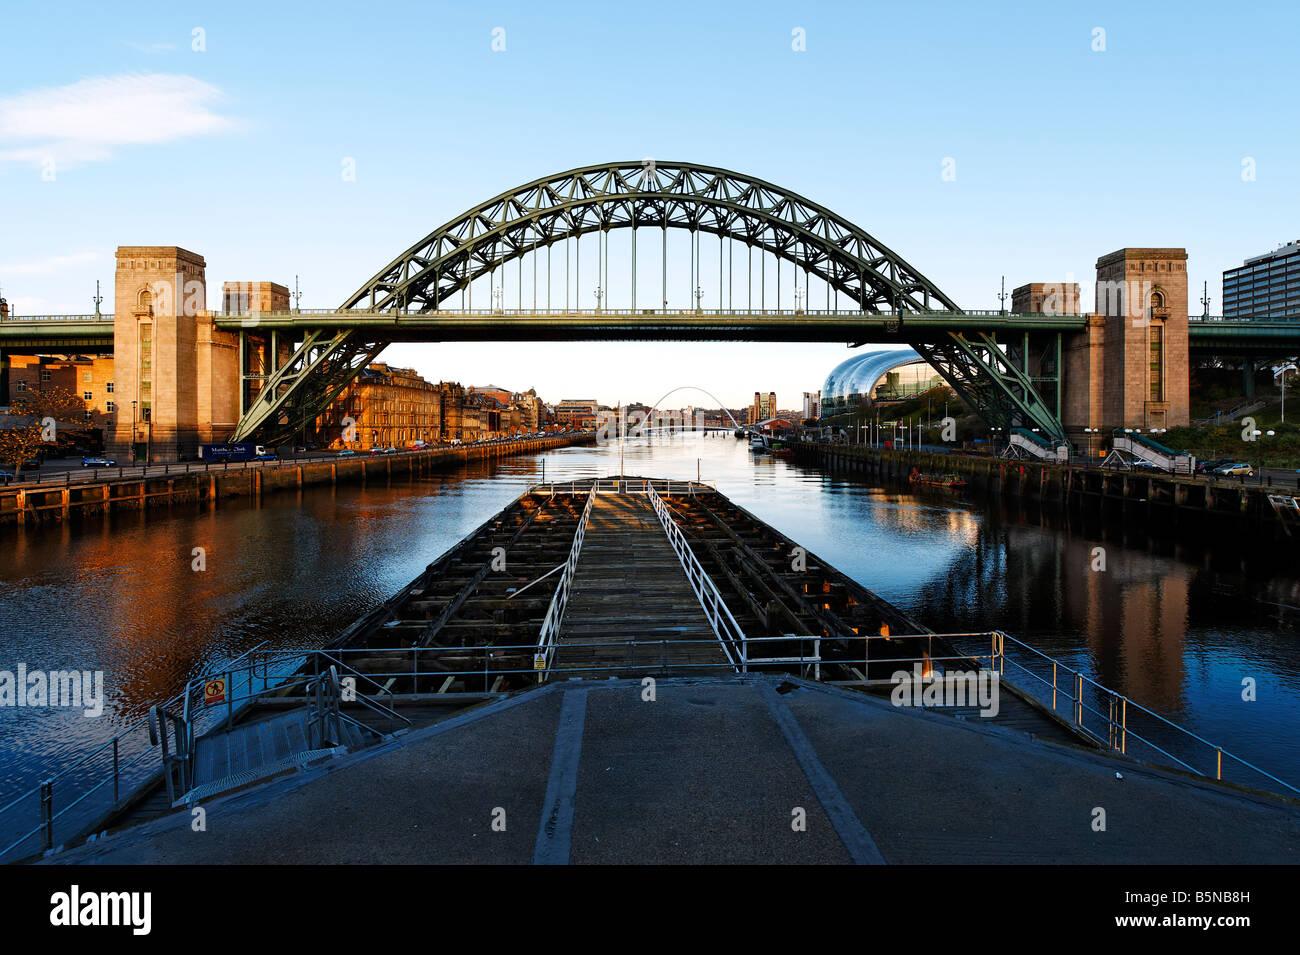 View of Tyne Bridge from Swingbridge - Stock Image